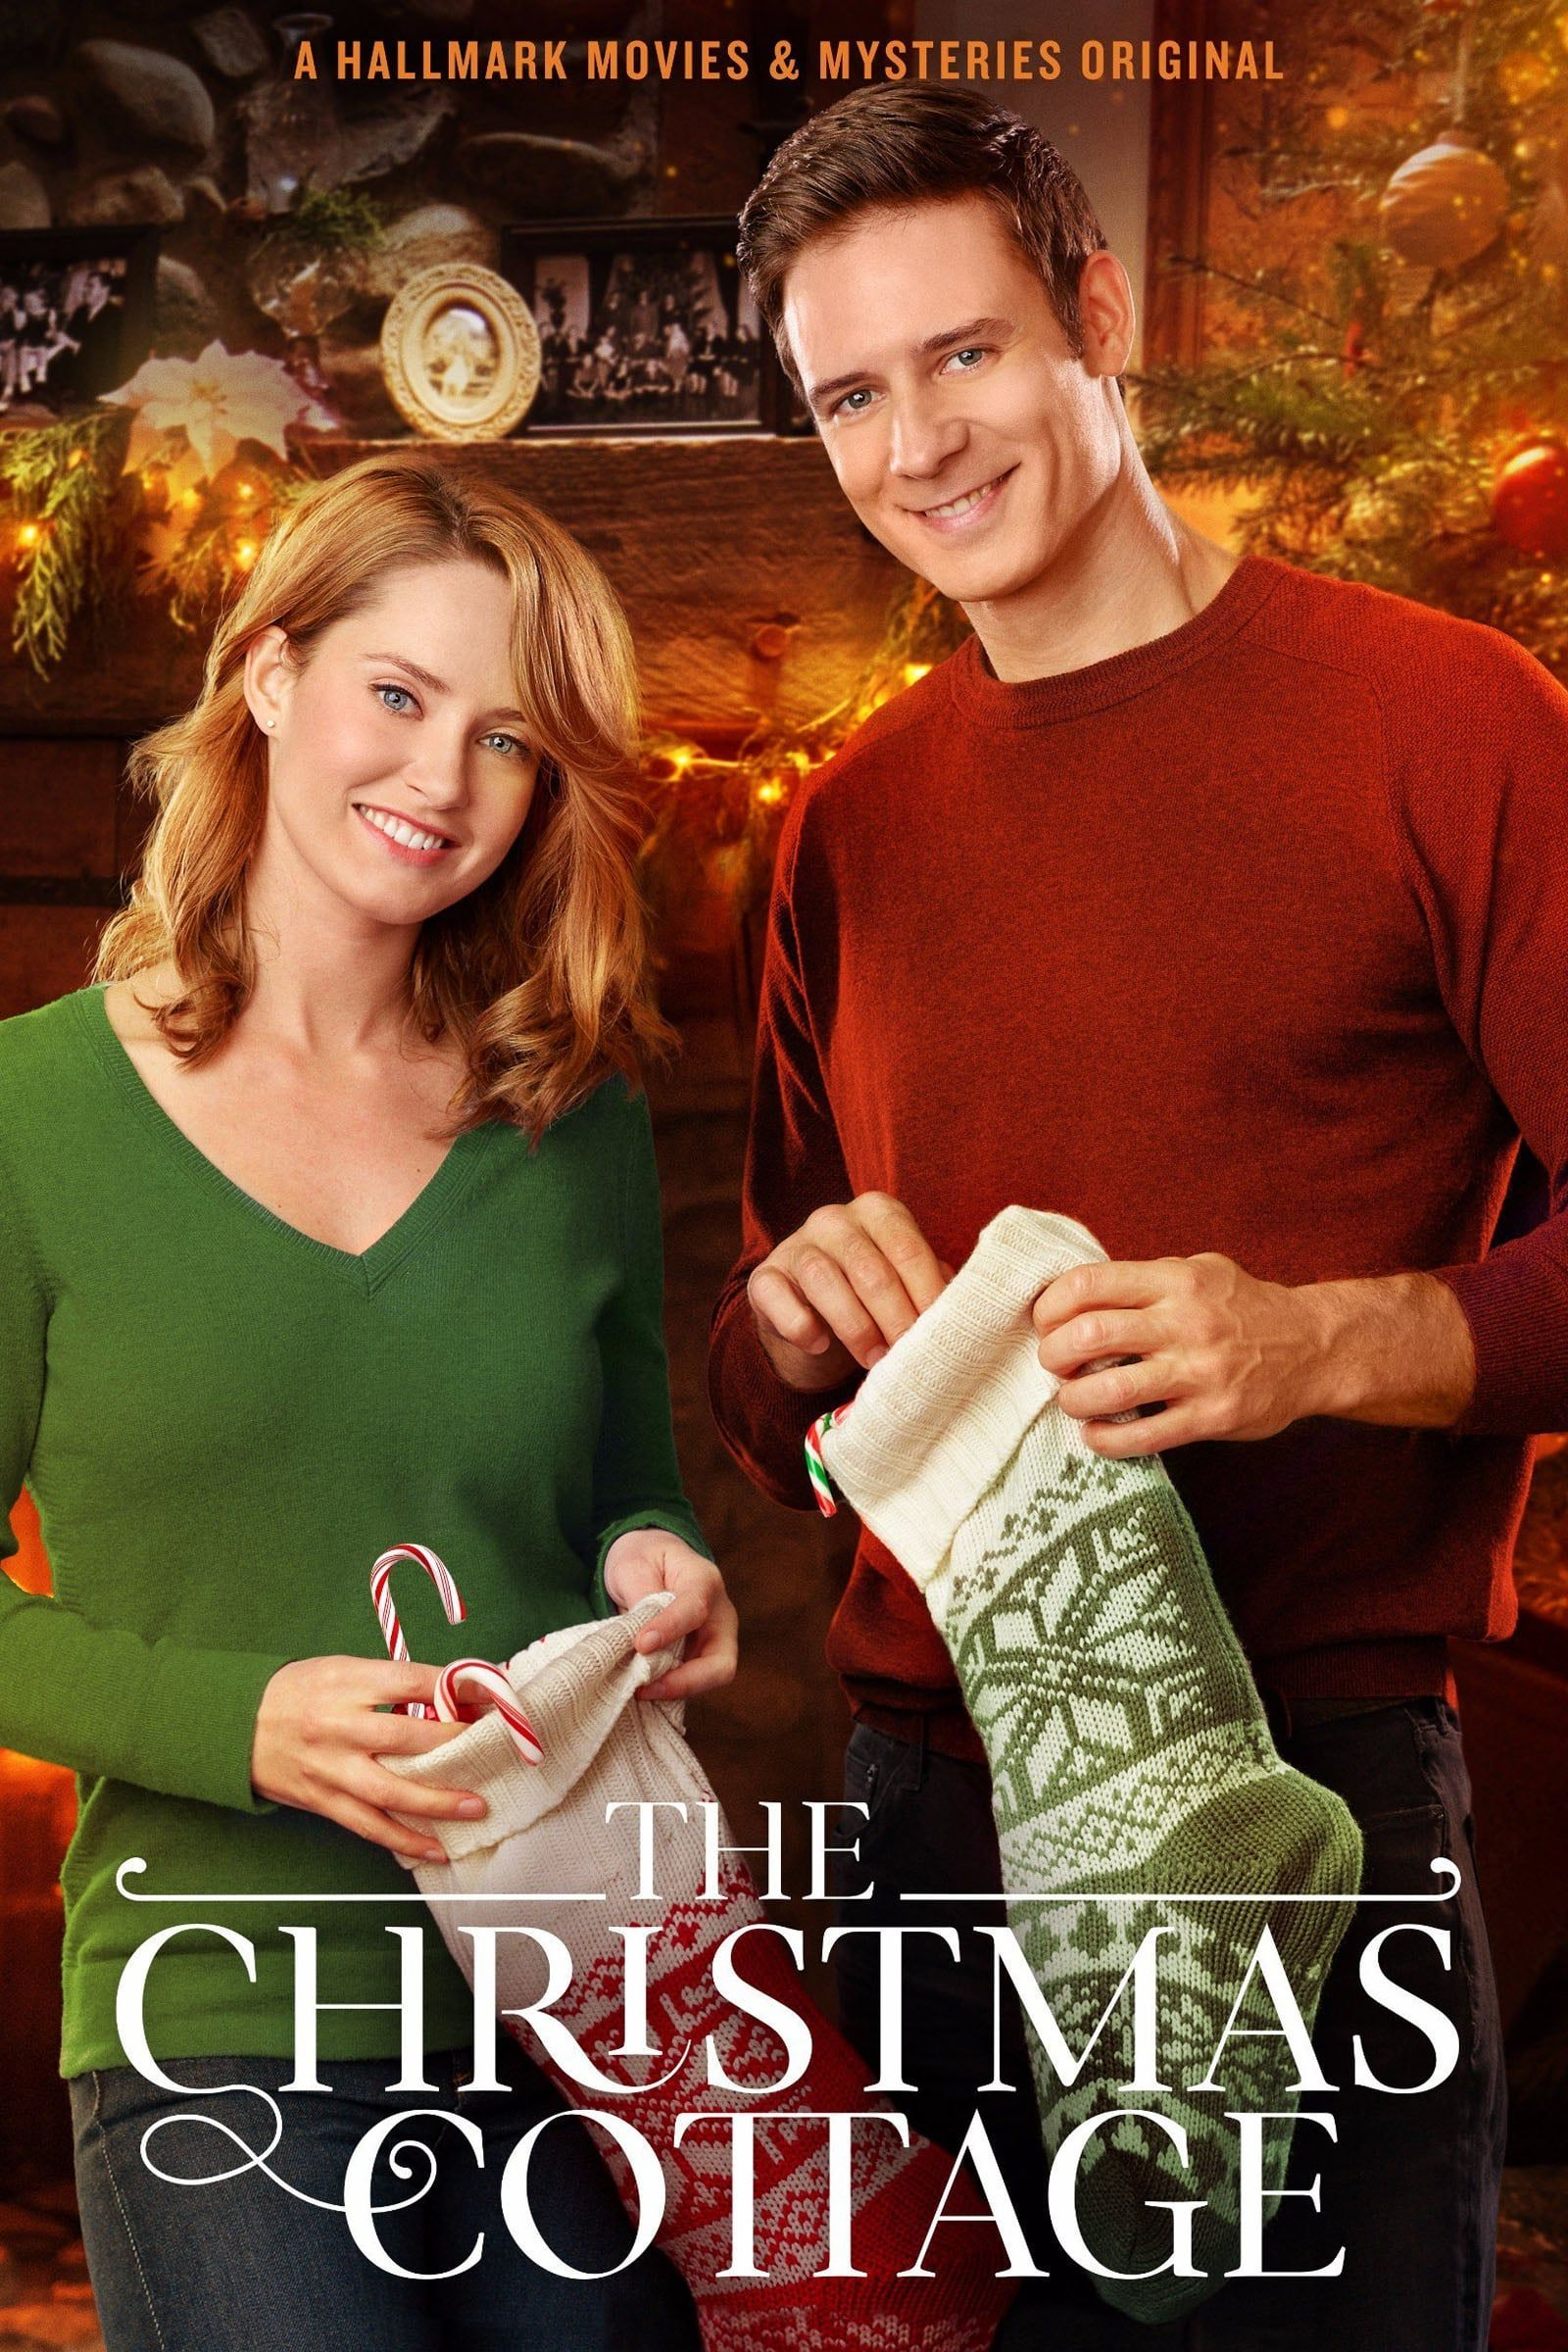 The Christmas Cottage FULL MOVIE HD1080p Sub English Play